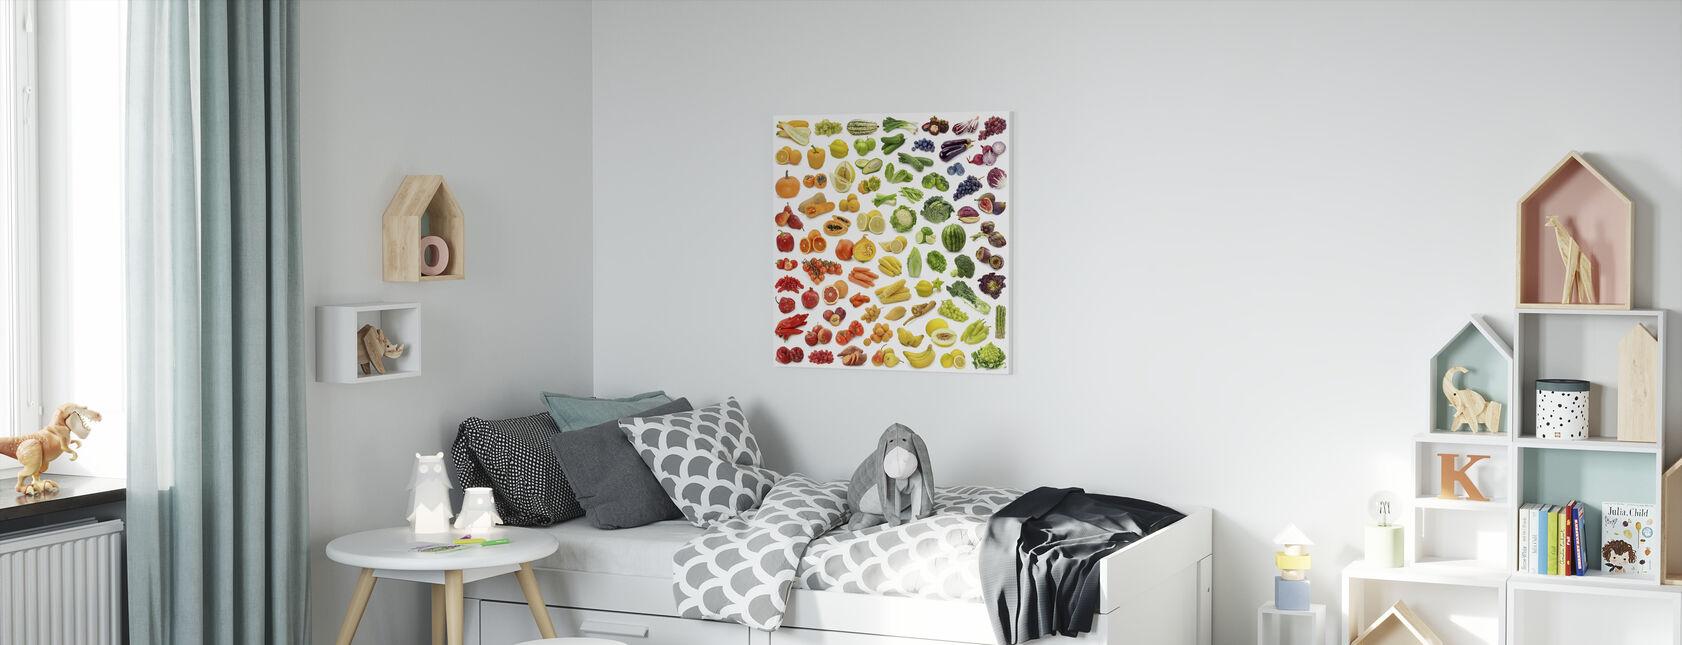 Juicy Fruits - Canvas print - Kids Room